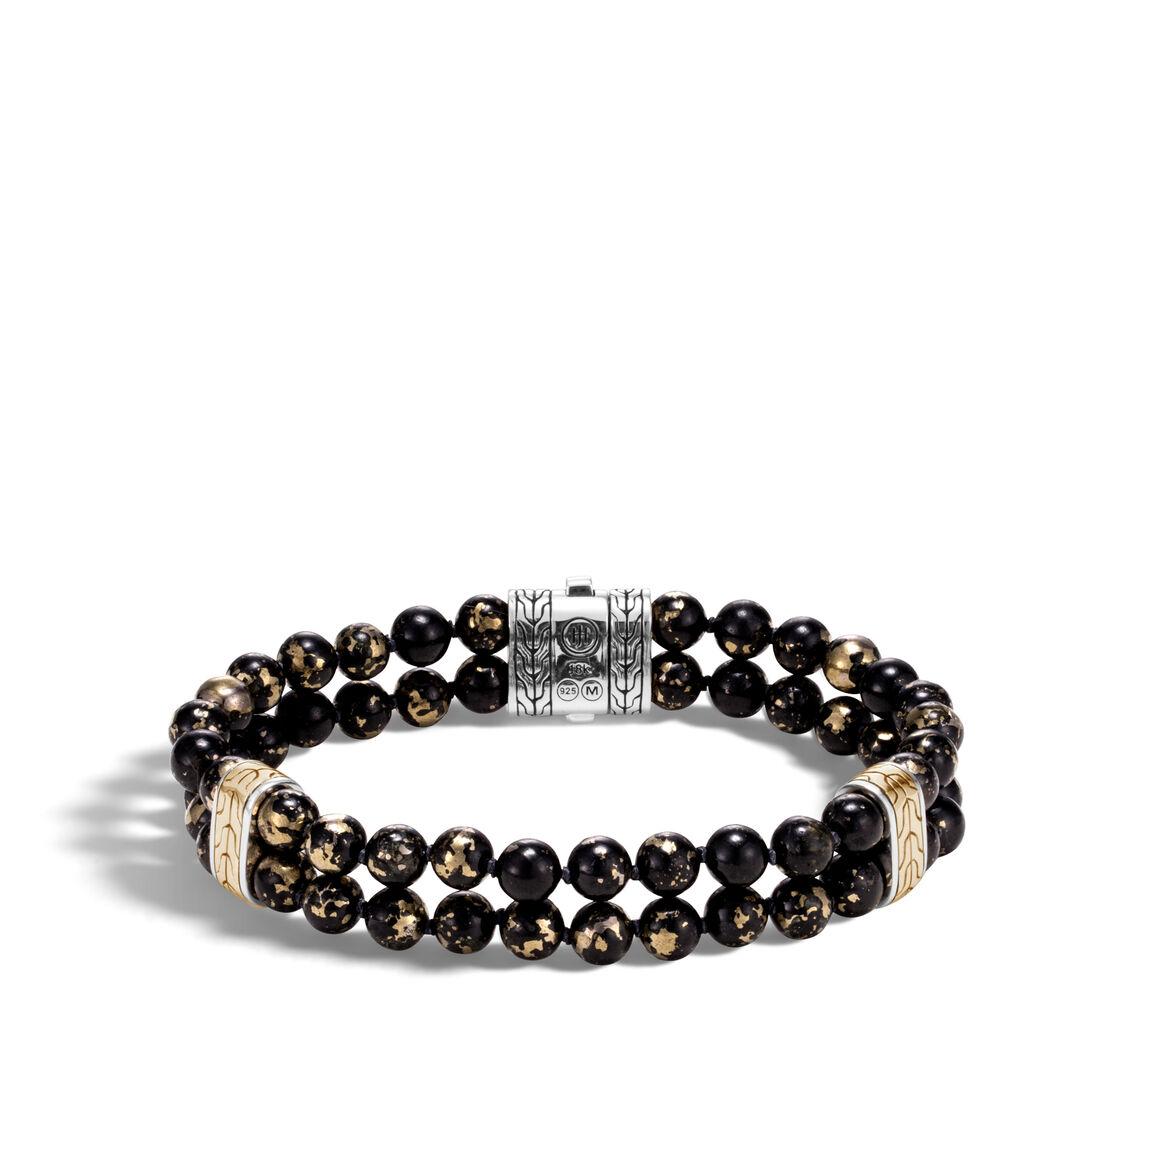 Chain Double Row Bead Bracelet, Silver, 18K Gold, 6MM Gems